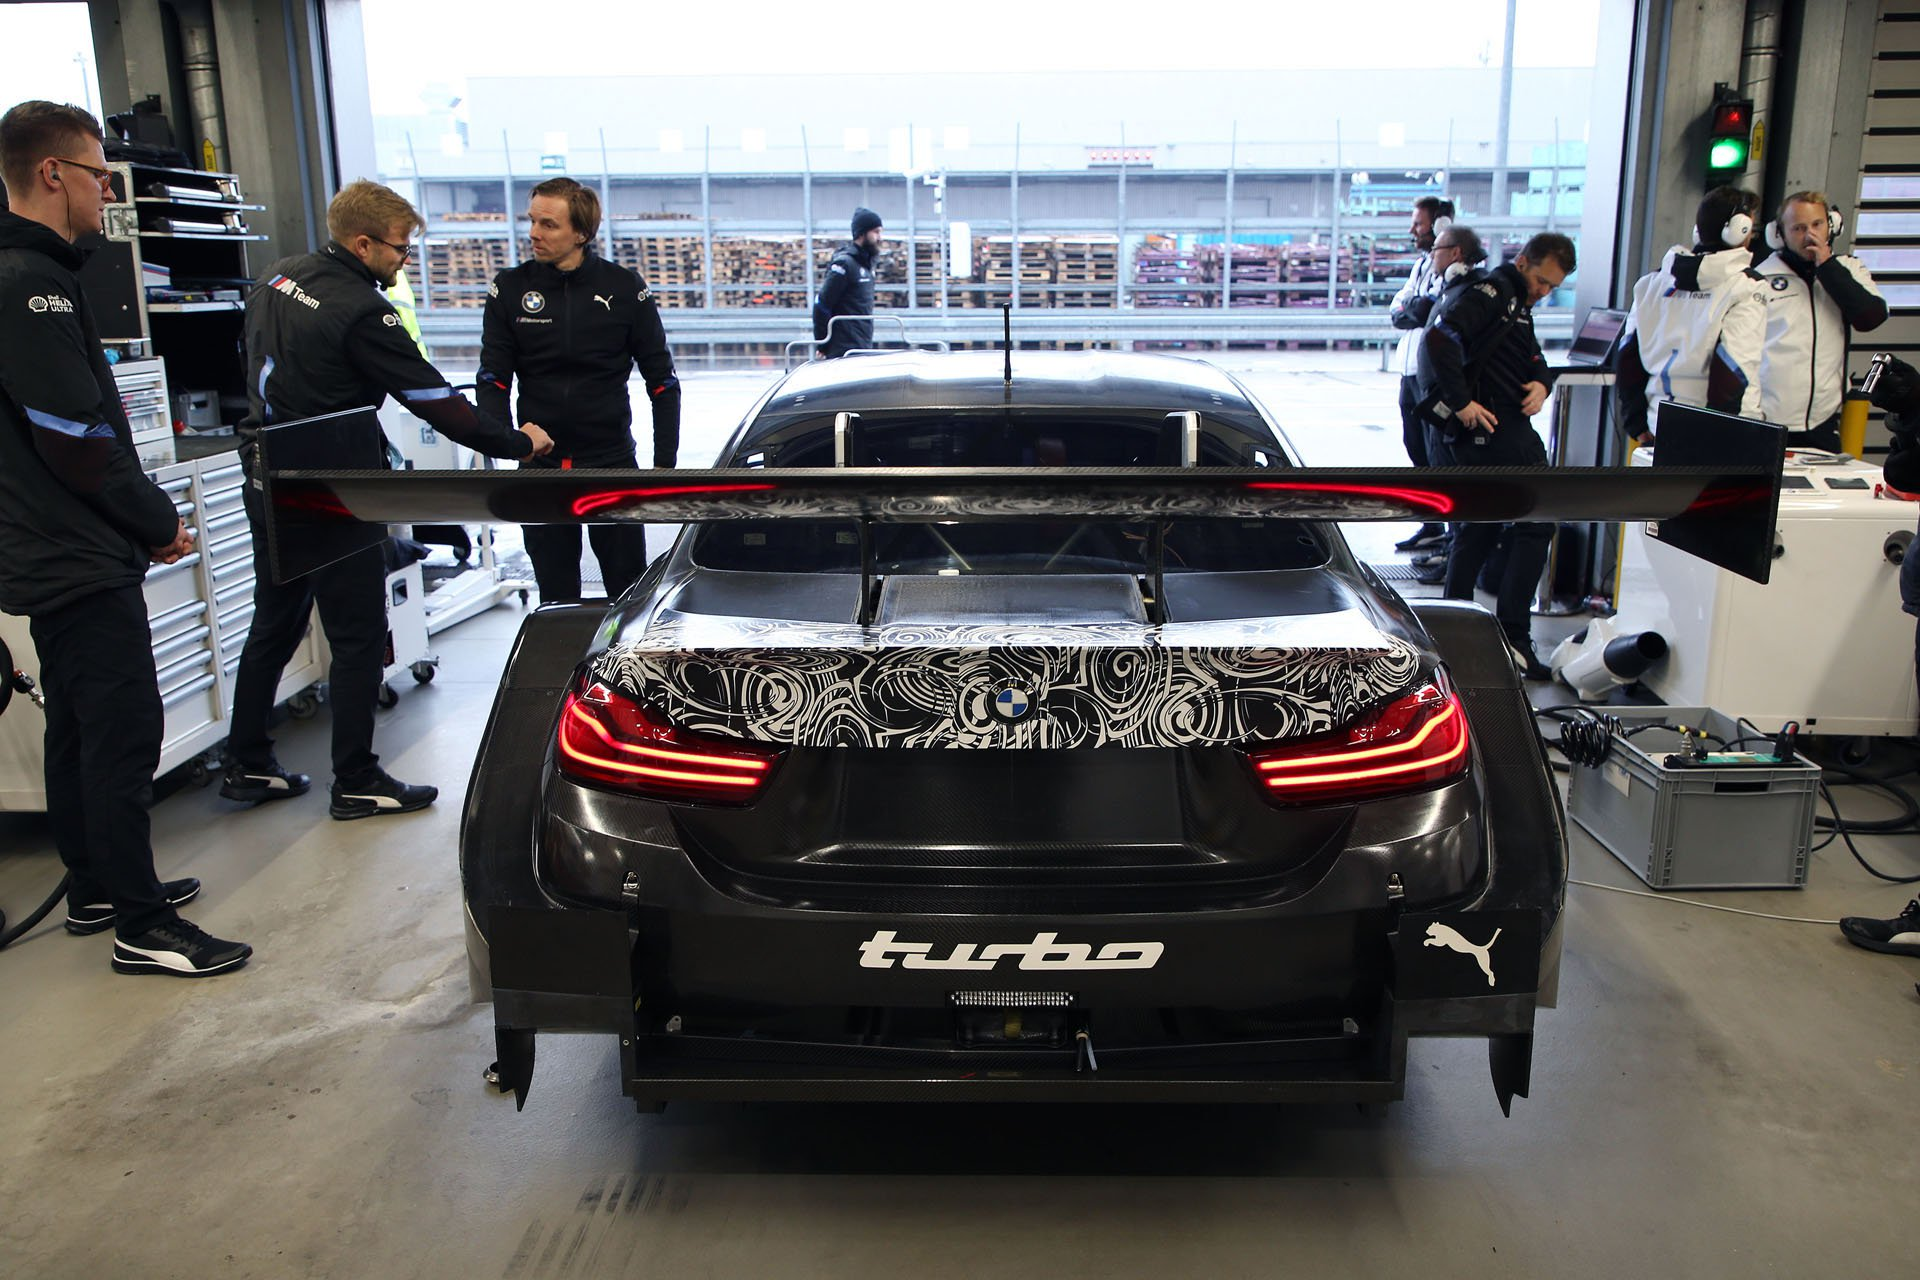 2019 Bmw M4 Dtm Racer To Use Four Pot Turbo Engine